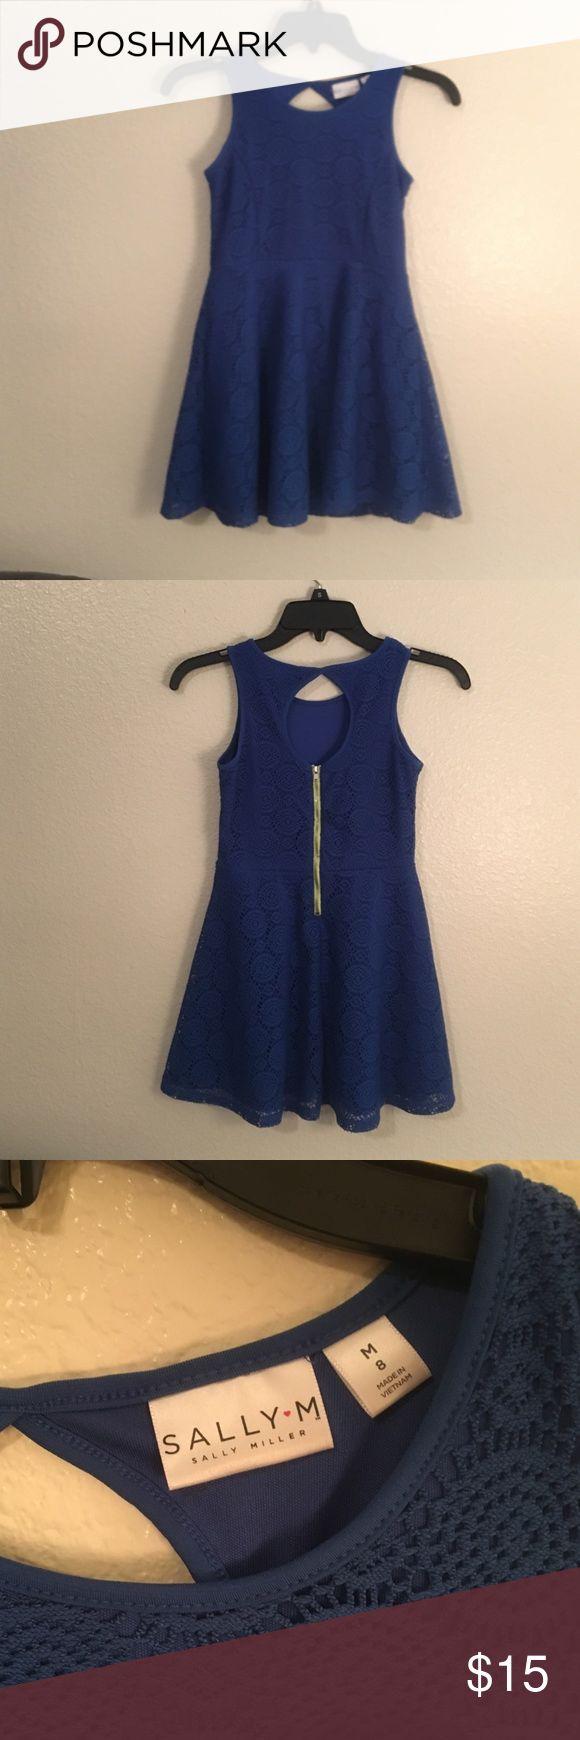 Girl's size 8 blue dress by Sally Miller Sally Miller sleeveless dress. Girls size 8 (medium). Beautiful royal blue crochet style overplayed on blue slip. Fashion zipper is yellow/ green. Sally Miller Dresses